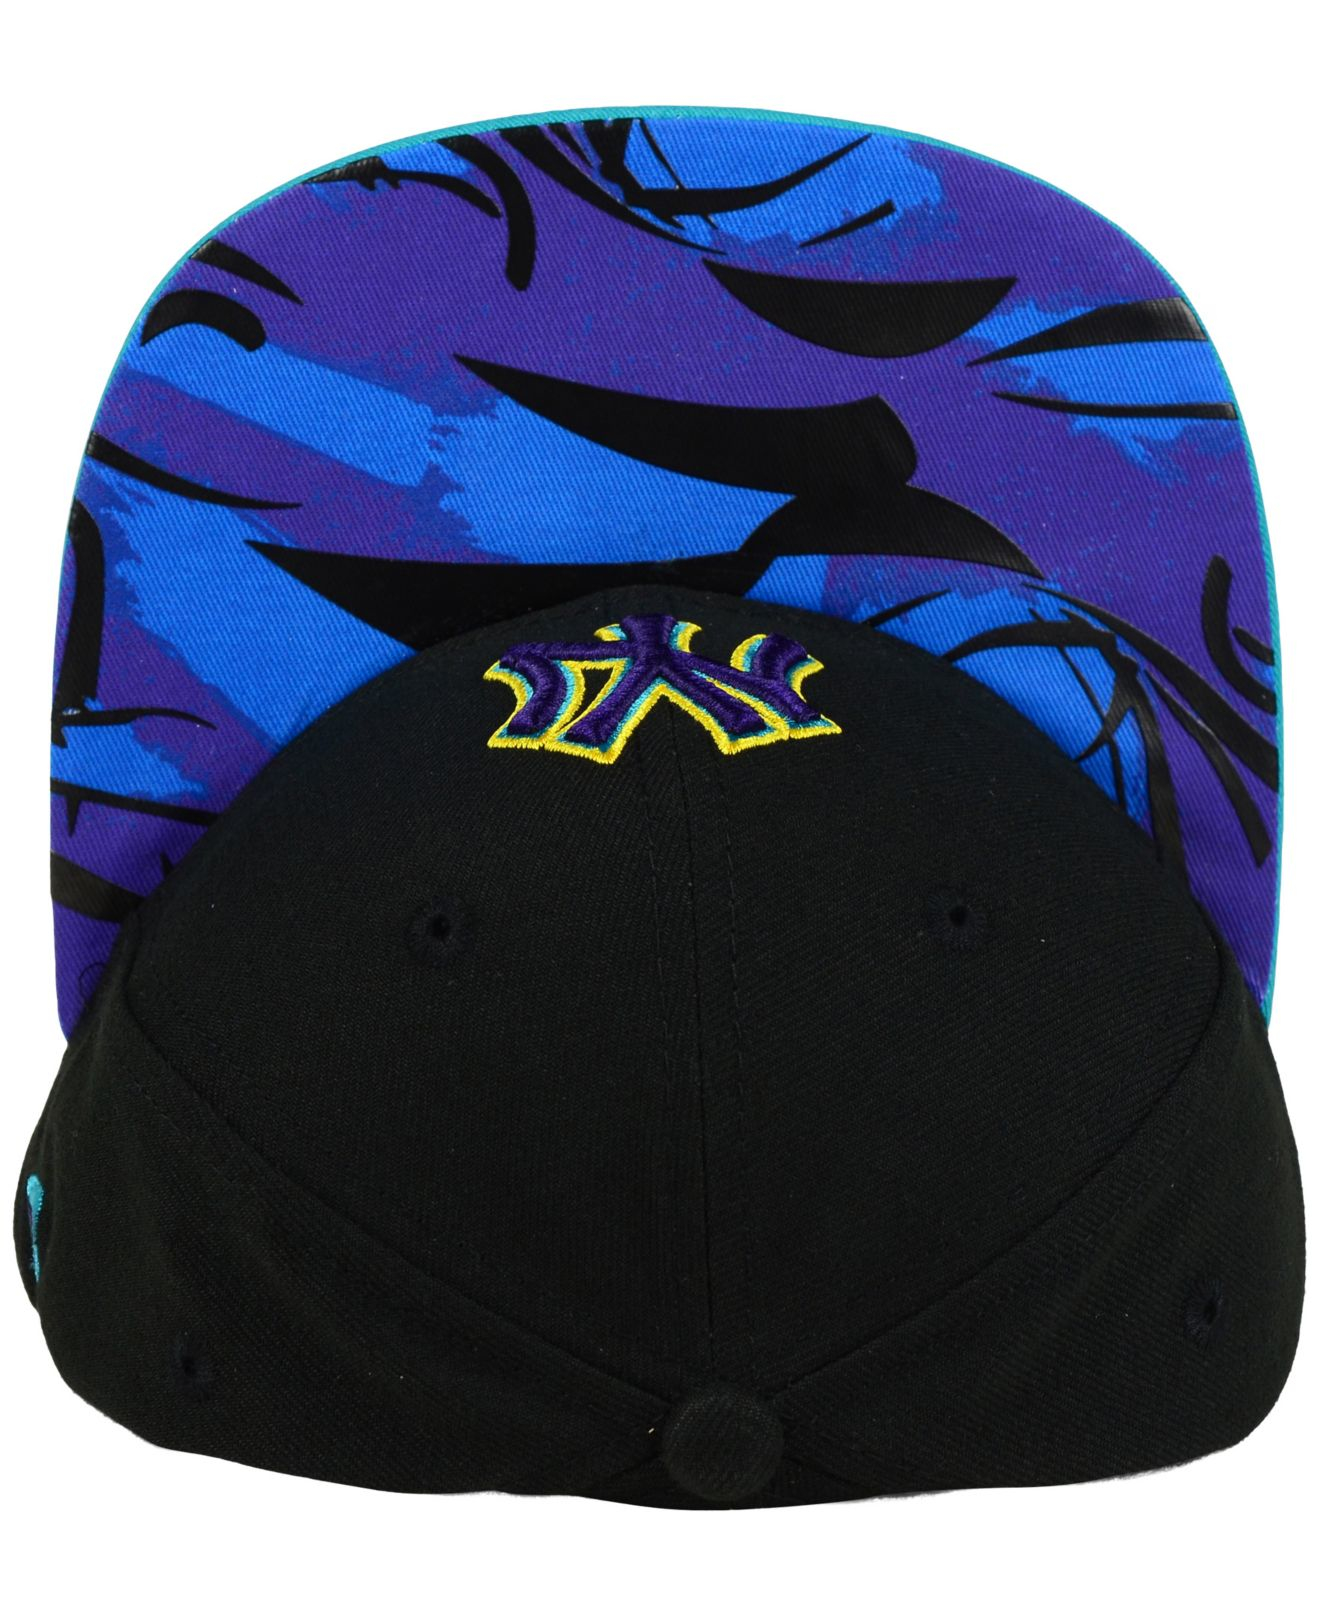 4768b12173b ... official lyst ktz new york yankees aqua hook vize 9fifty snapback cap  in a6b61 0b897